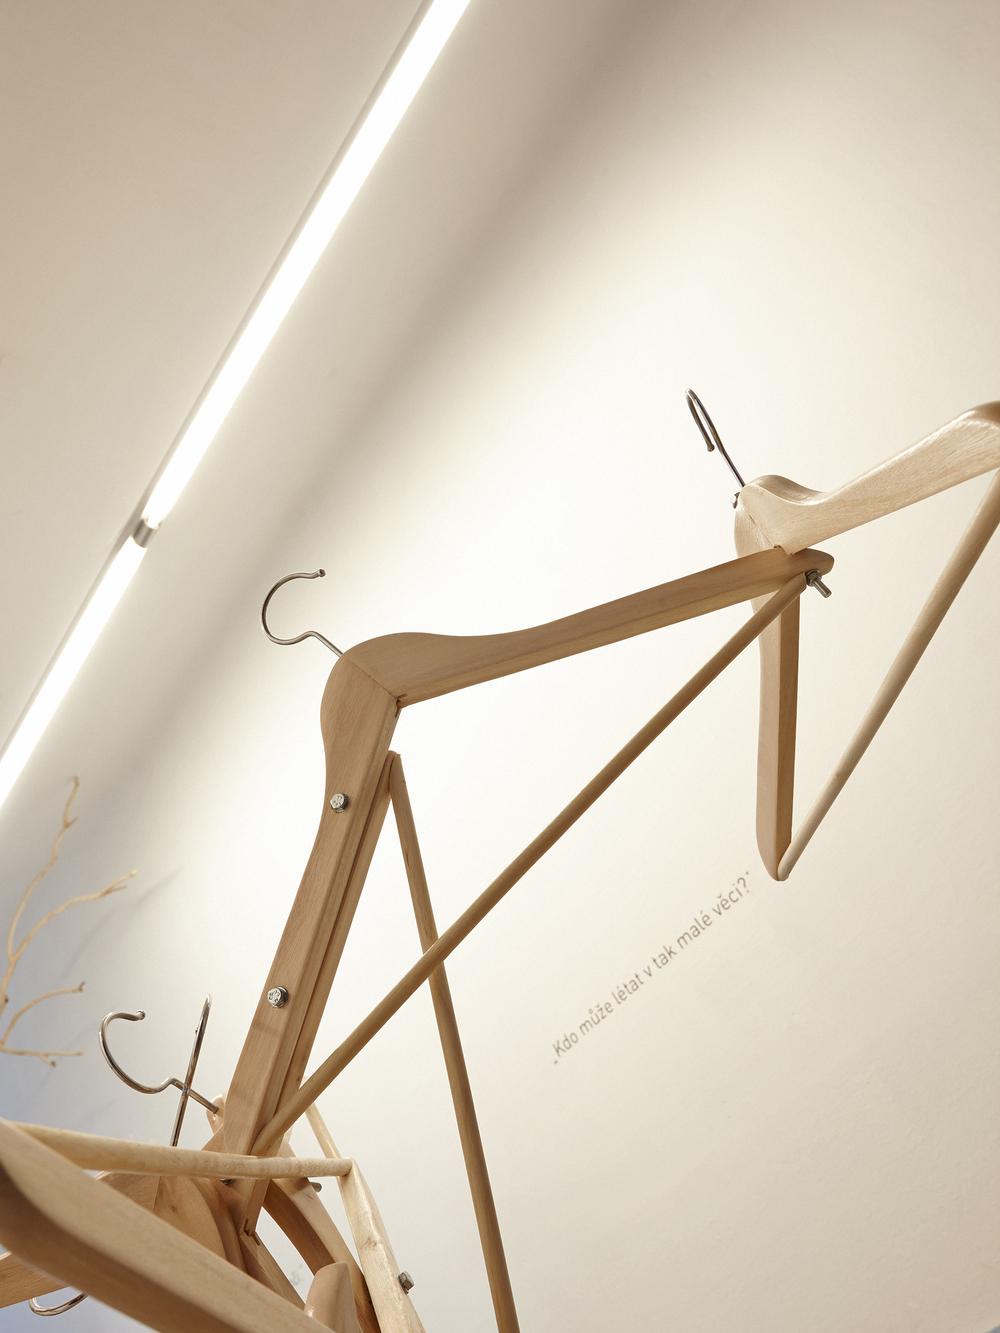 Installation_Insidecor_DesignBlok_15.jpg